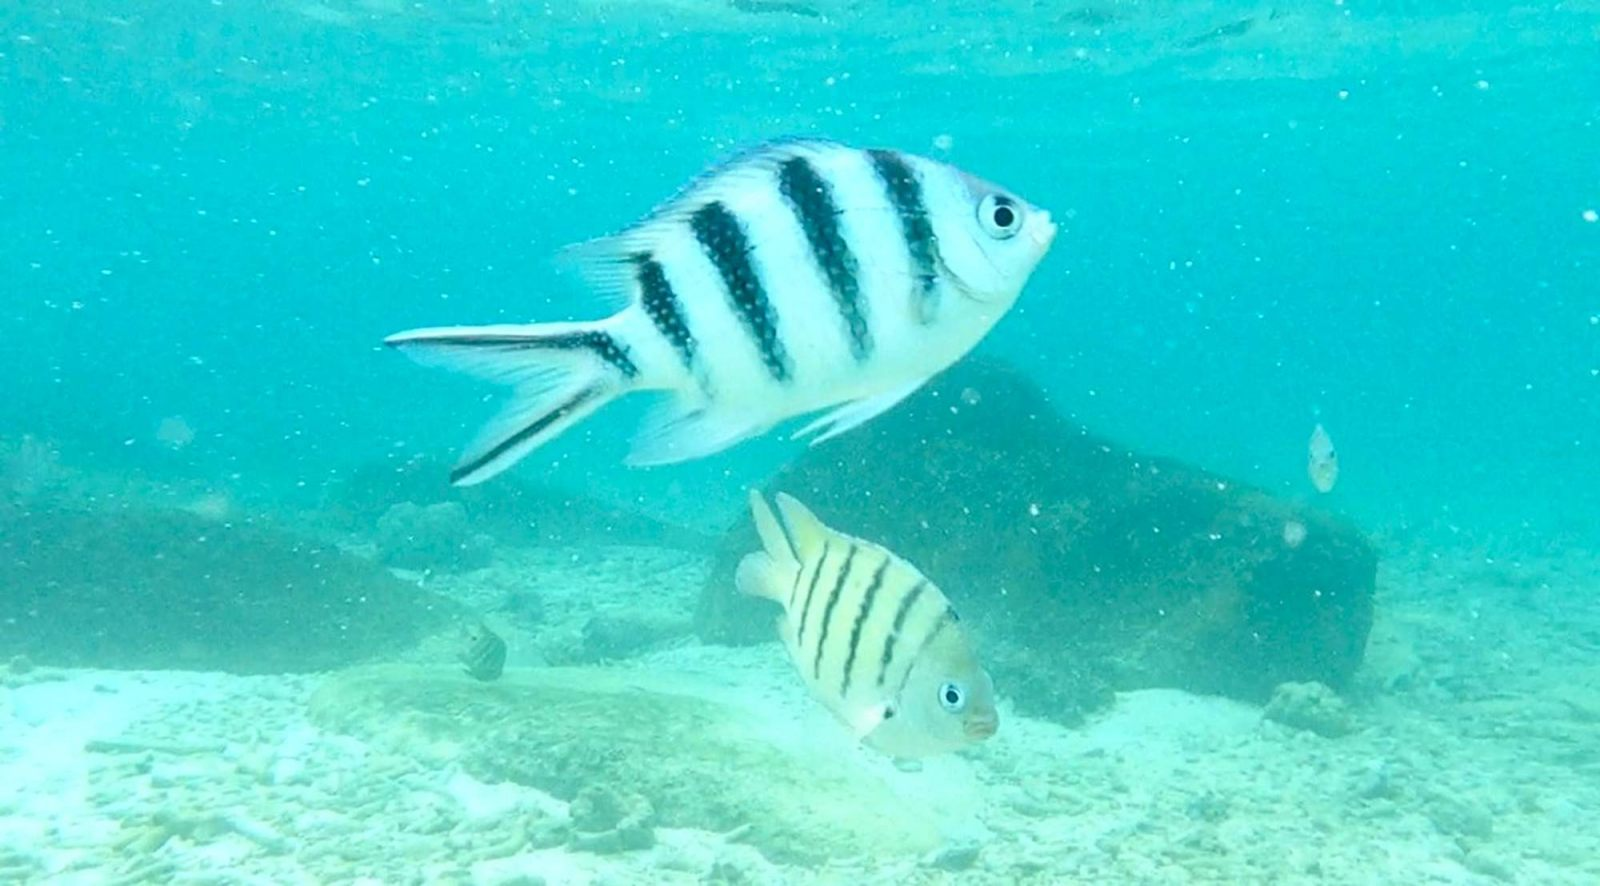 Hibiscus & Nomada : - - Snorkeling in Koh Tao